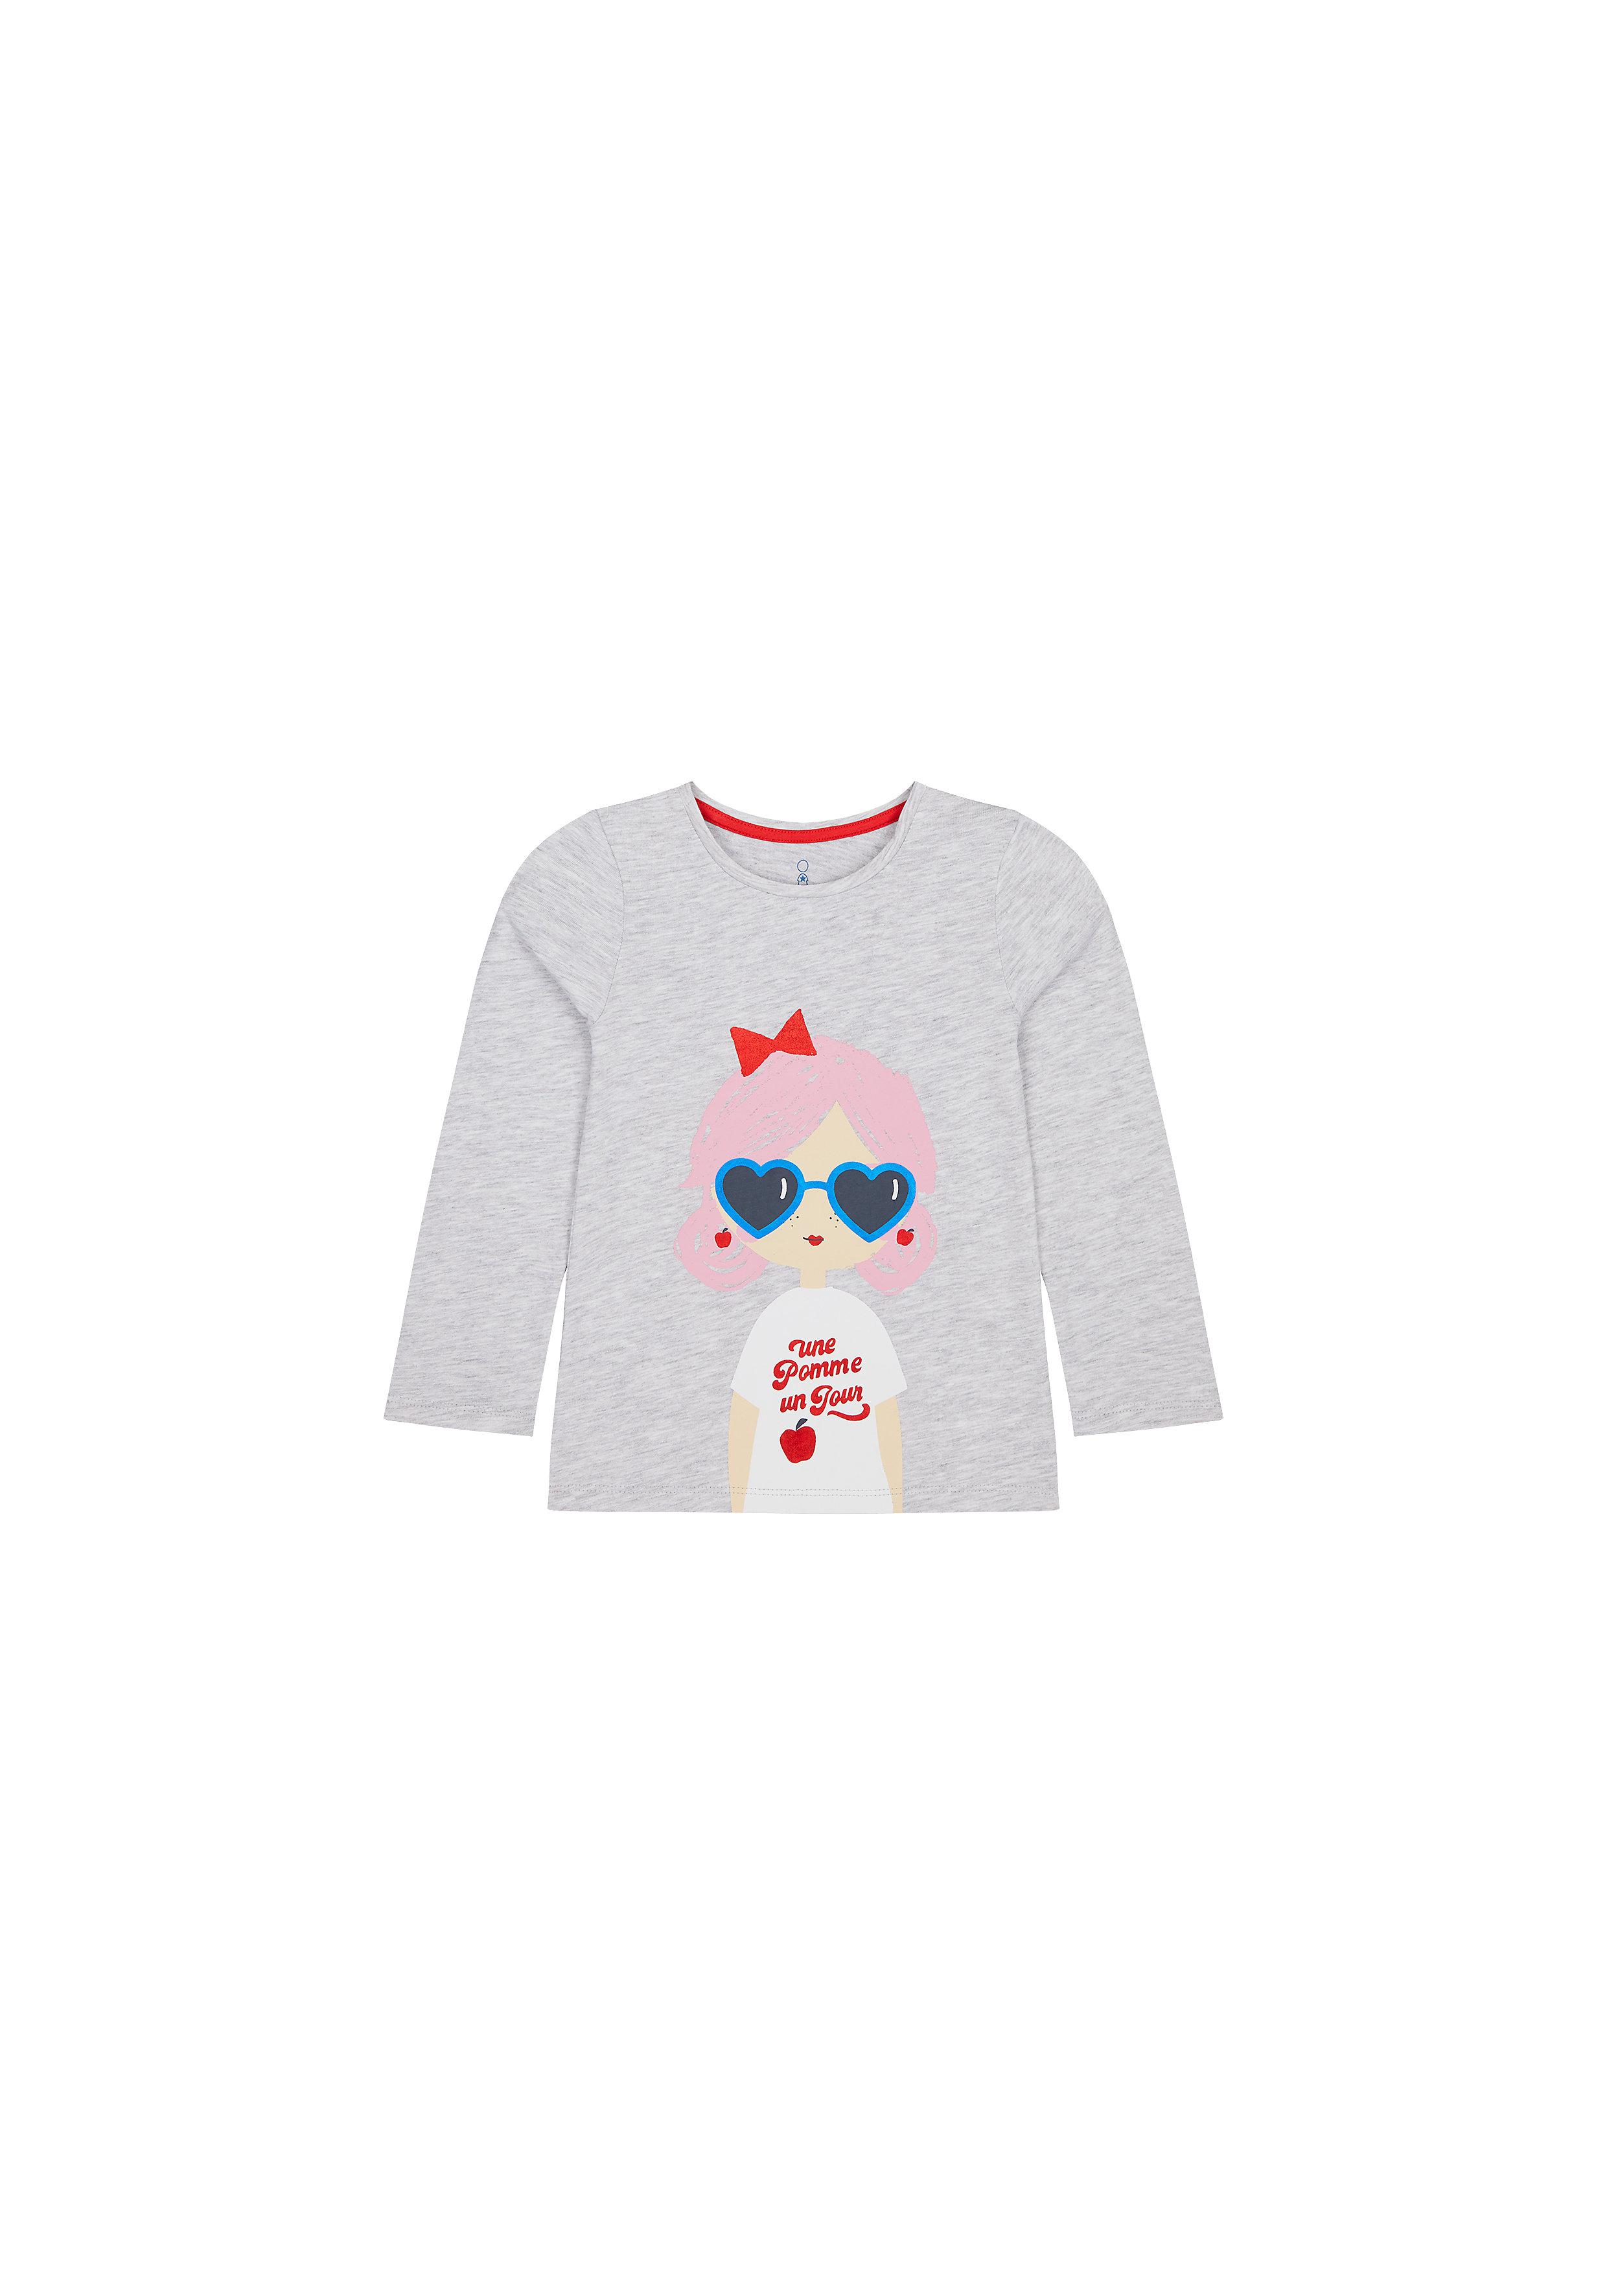 Mothercare | Girls Full Sleeves T-Shirt Girl Print - Grey